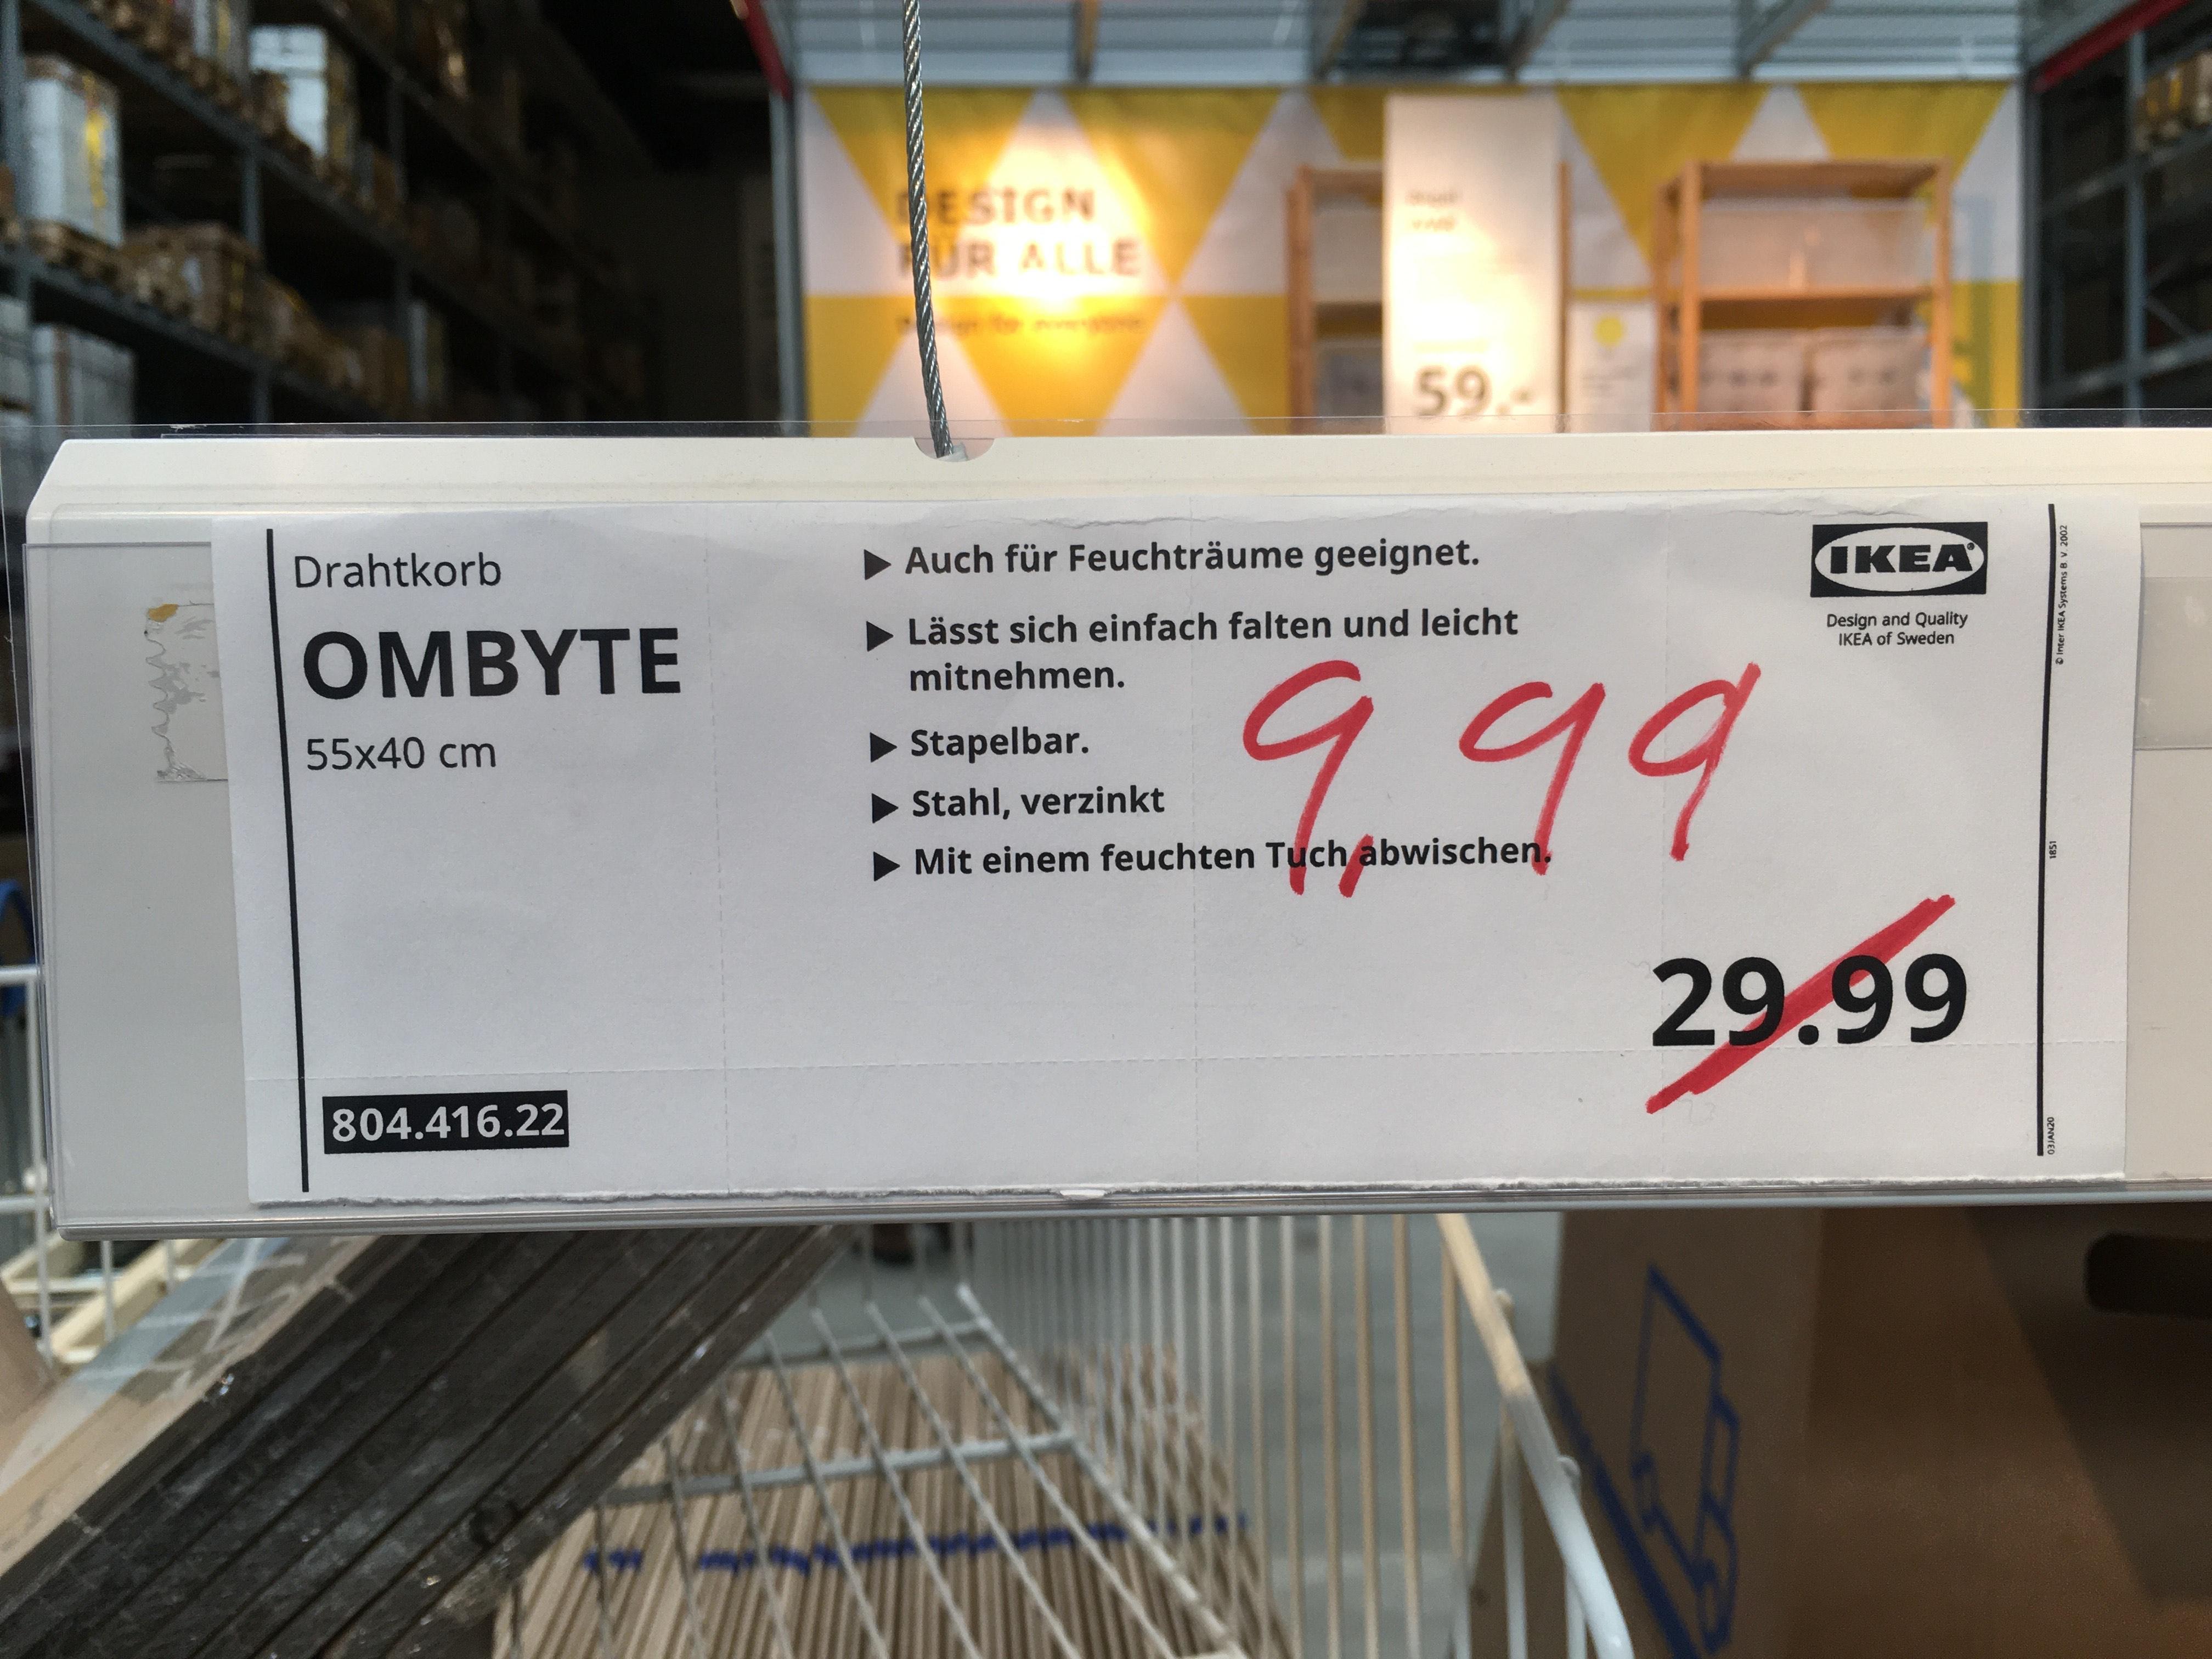 [LOKAL] IKEA Berlin Tempelhof OMBYTE Drahtkorb